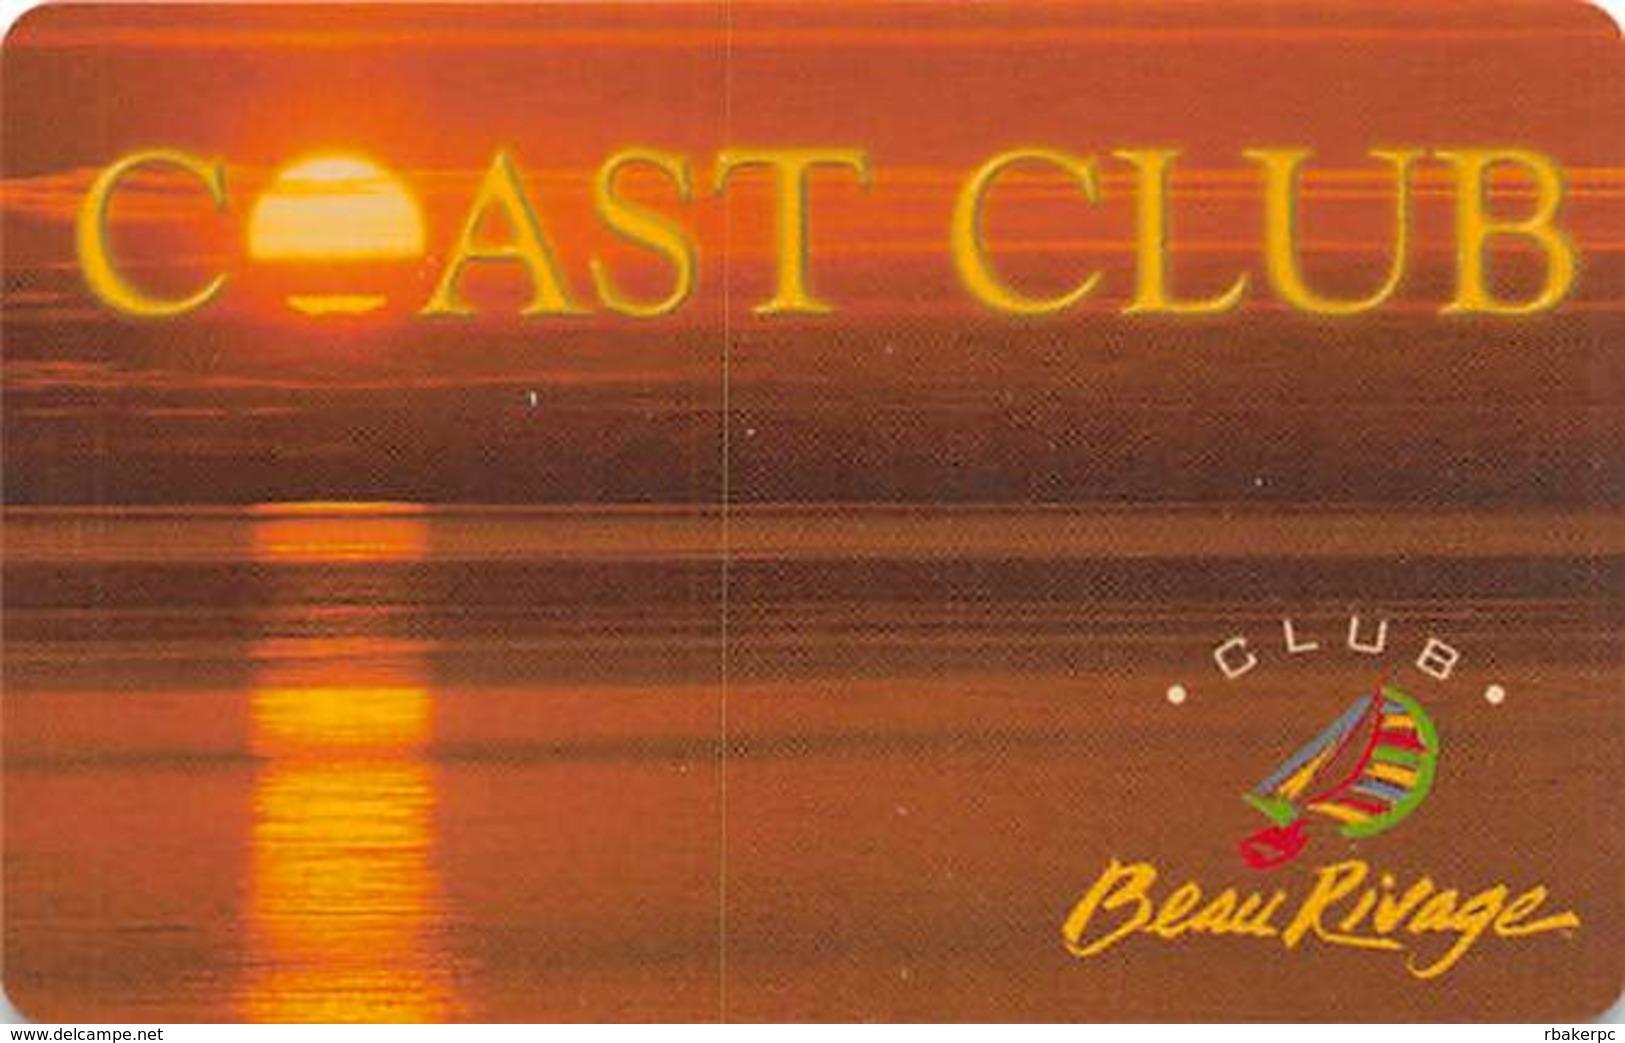 Beau Rivage Casino - Biloxi MS - BLANK Coast Club Slot Card For Locals - Casino Cards